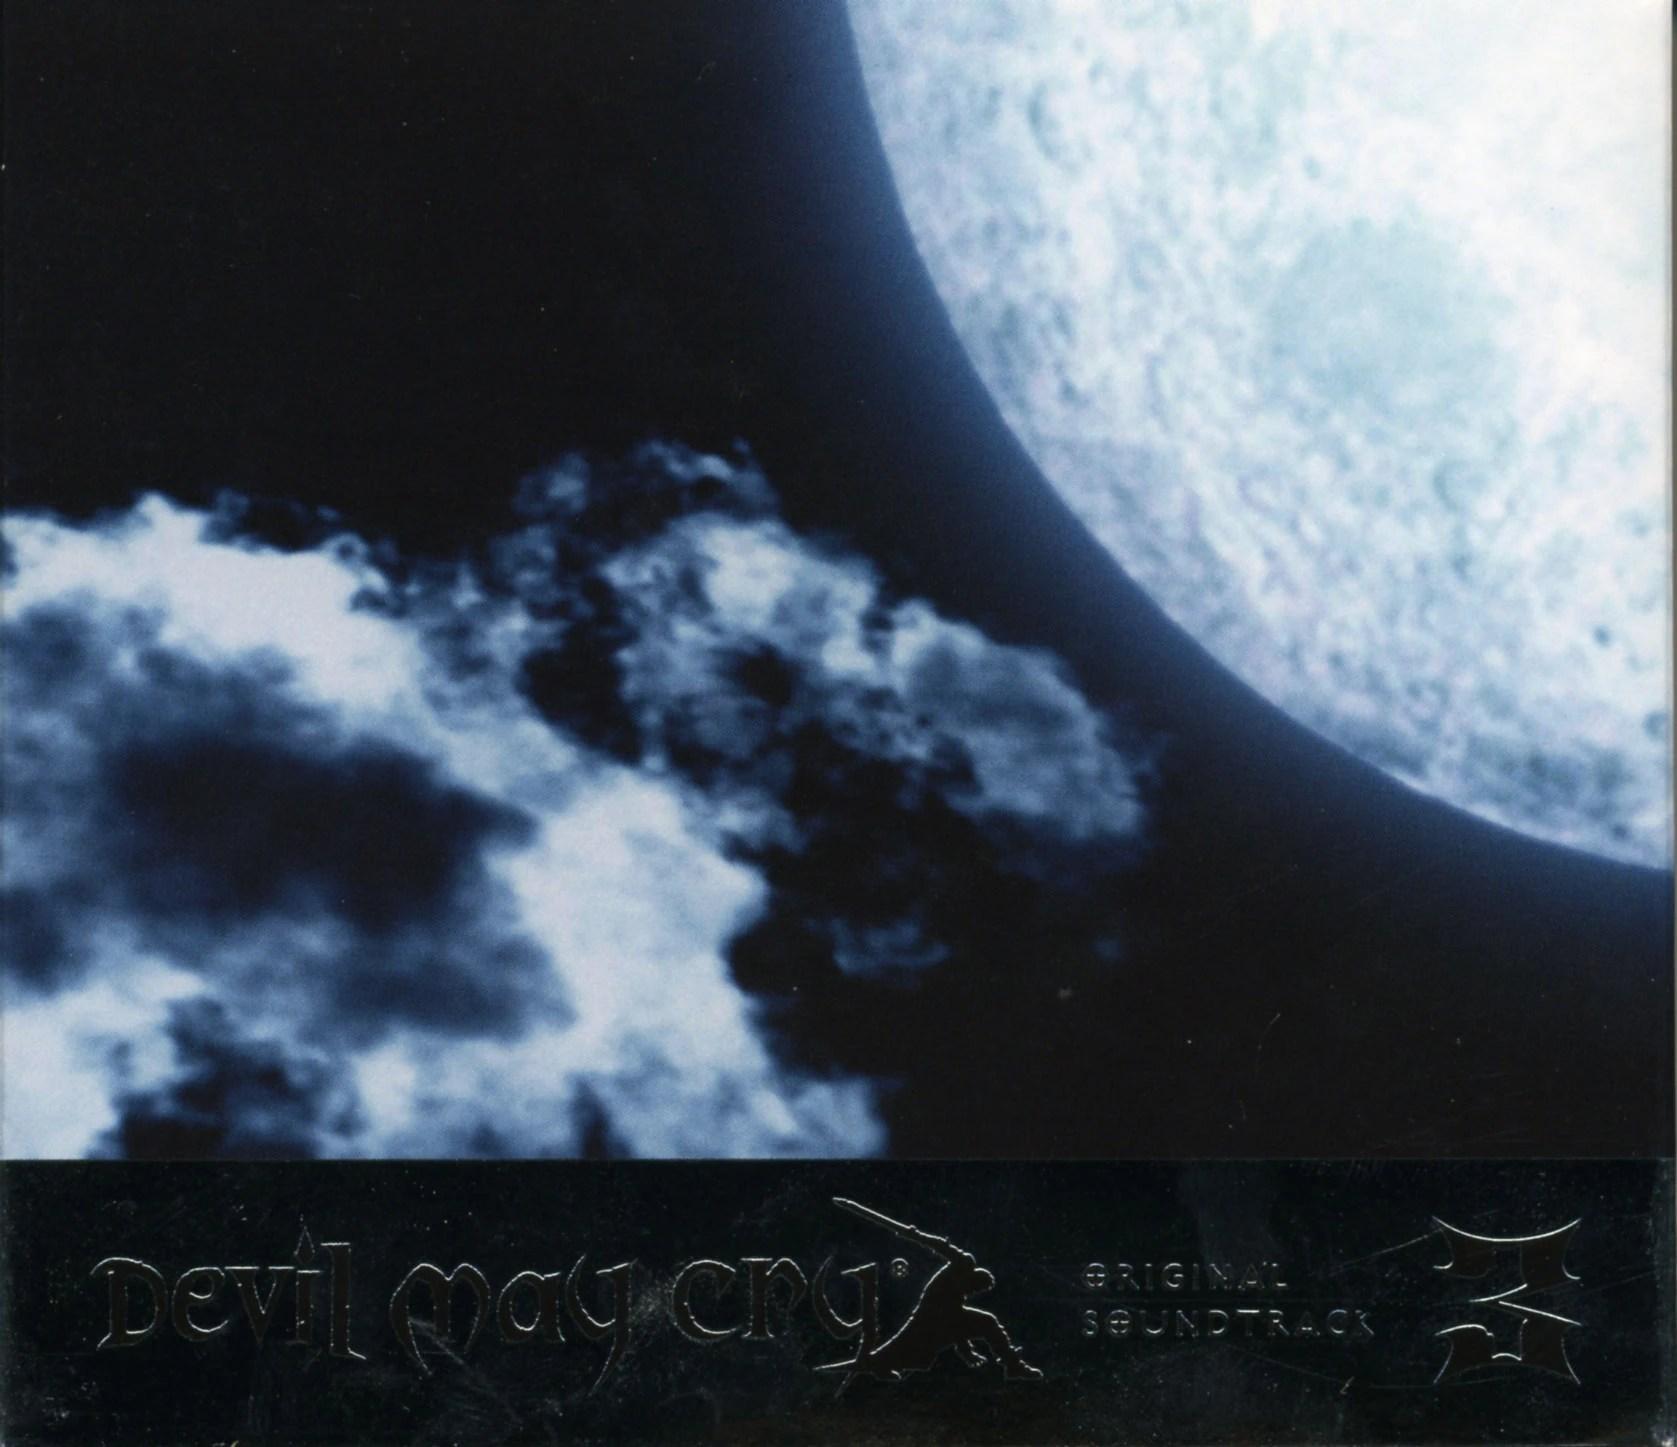 Devil May Cry 3 Original Soundtrack   Devil May Cry Wiki ...